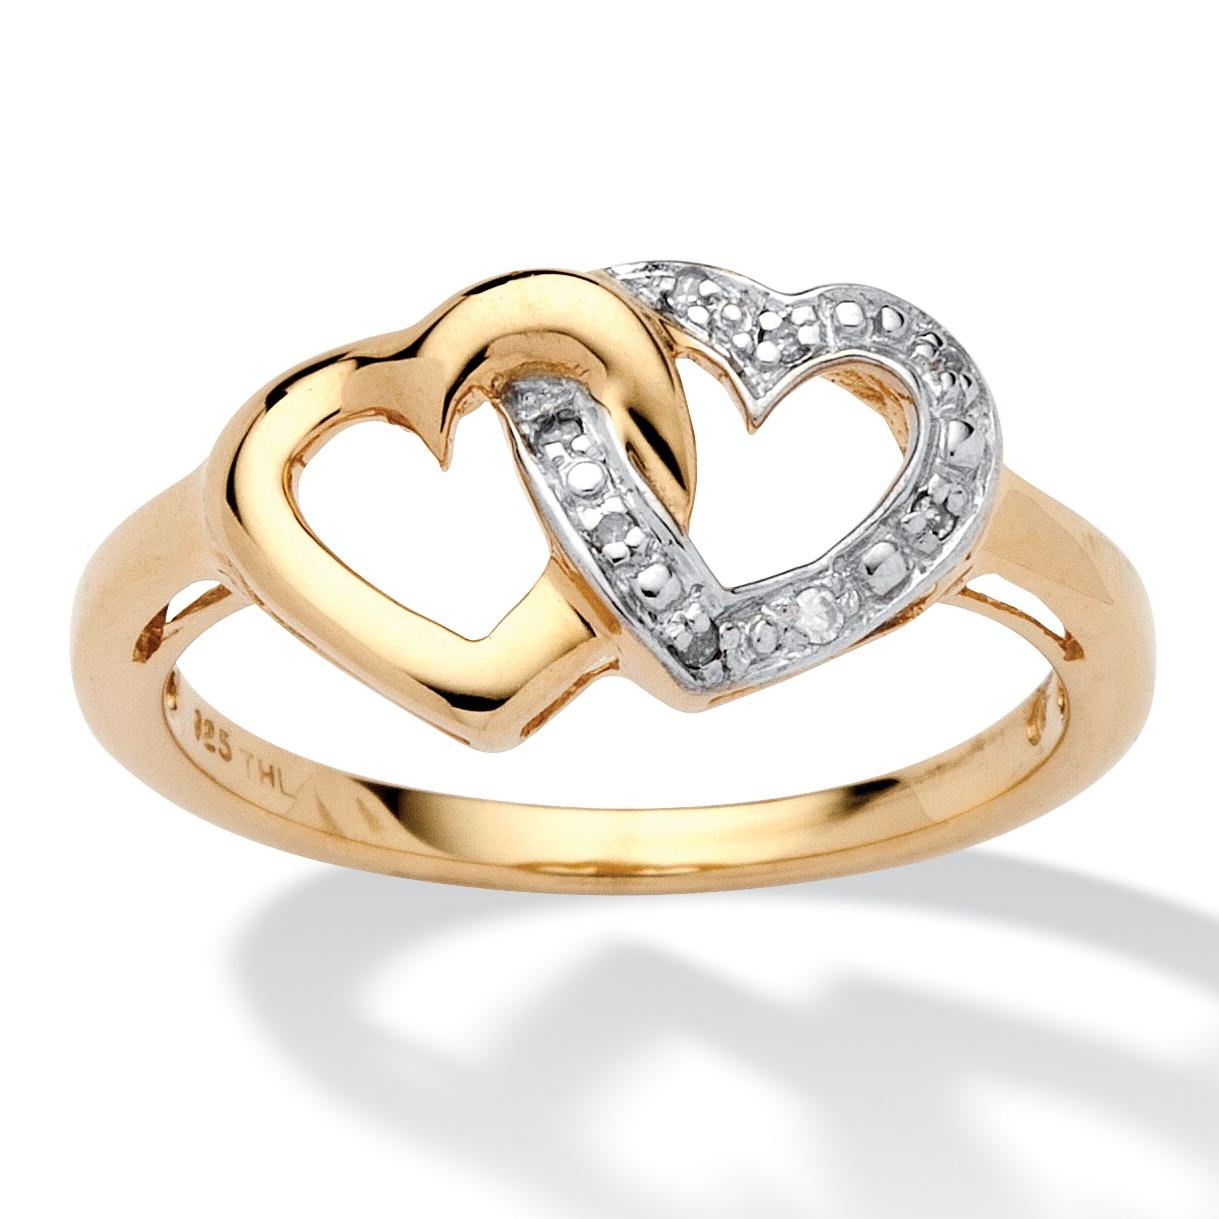 Diamond Rings For Sale Walmart: Diamond Accent Interlocking Heart Promise Ring In 18k Gold